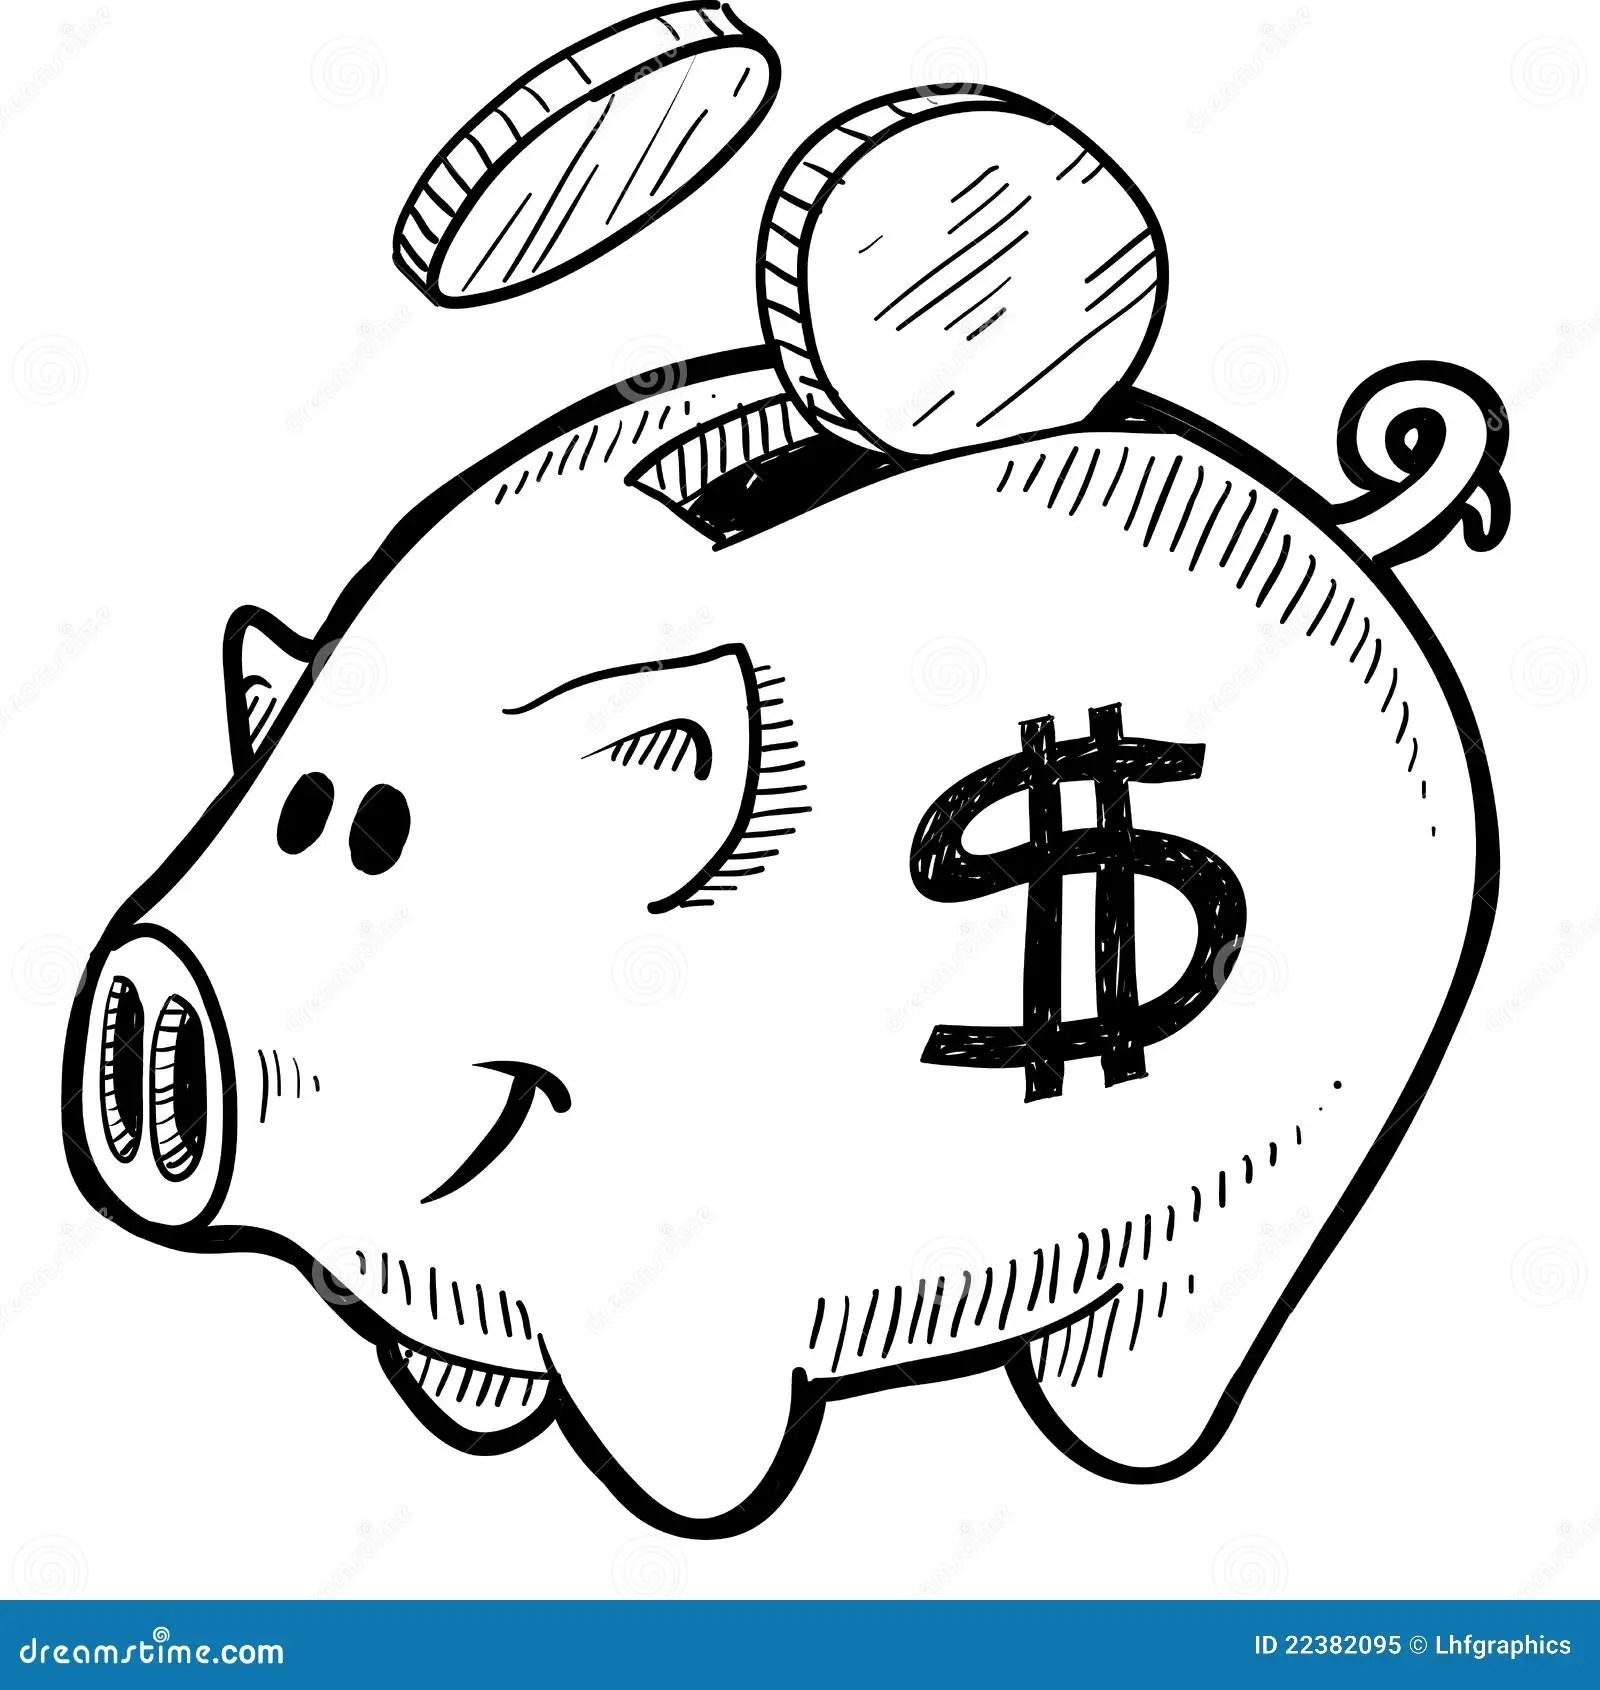 Piggy Bank Sketch Stock Vector Illustration Of Sign